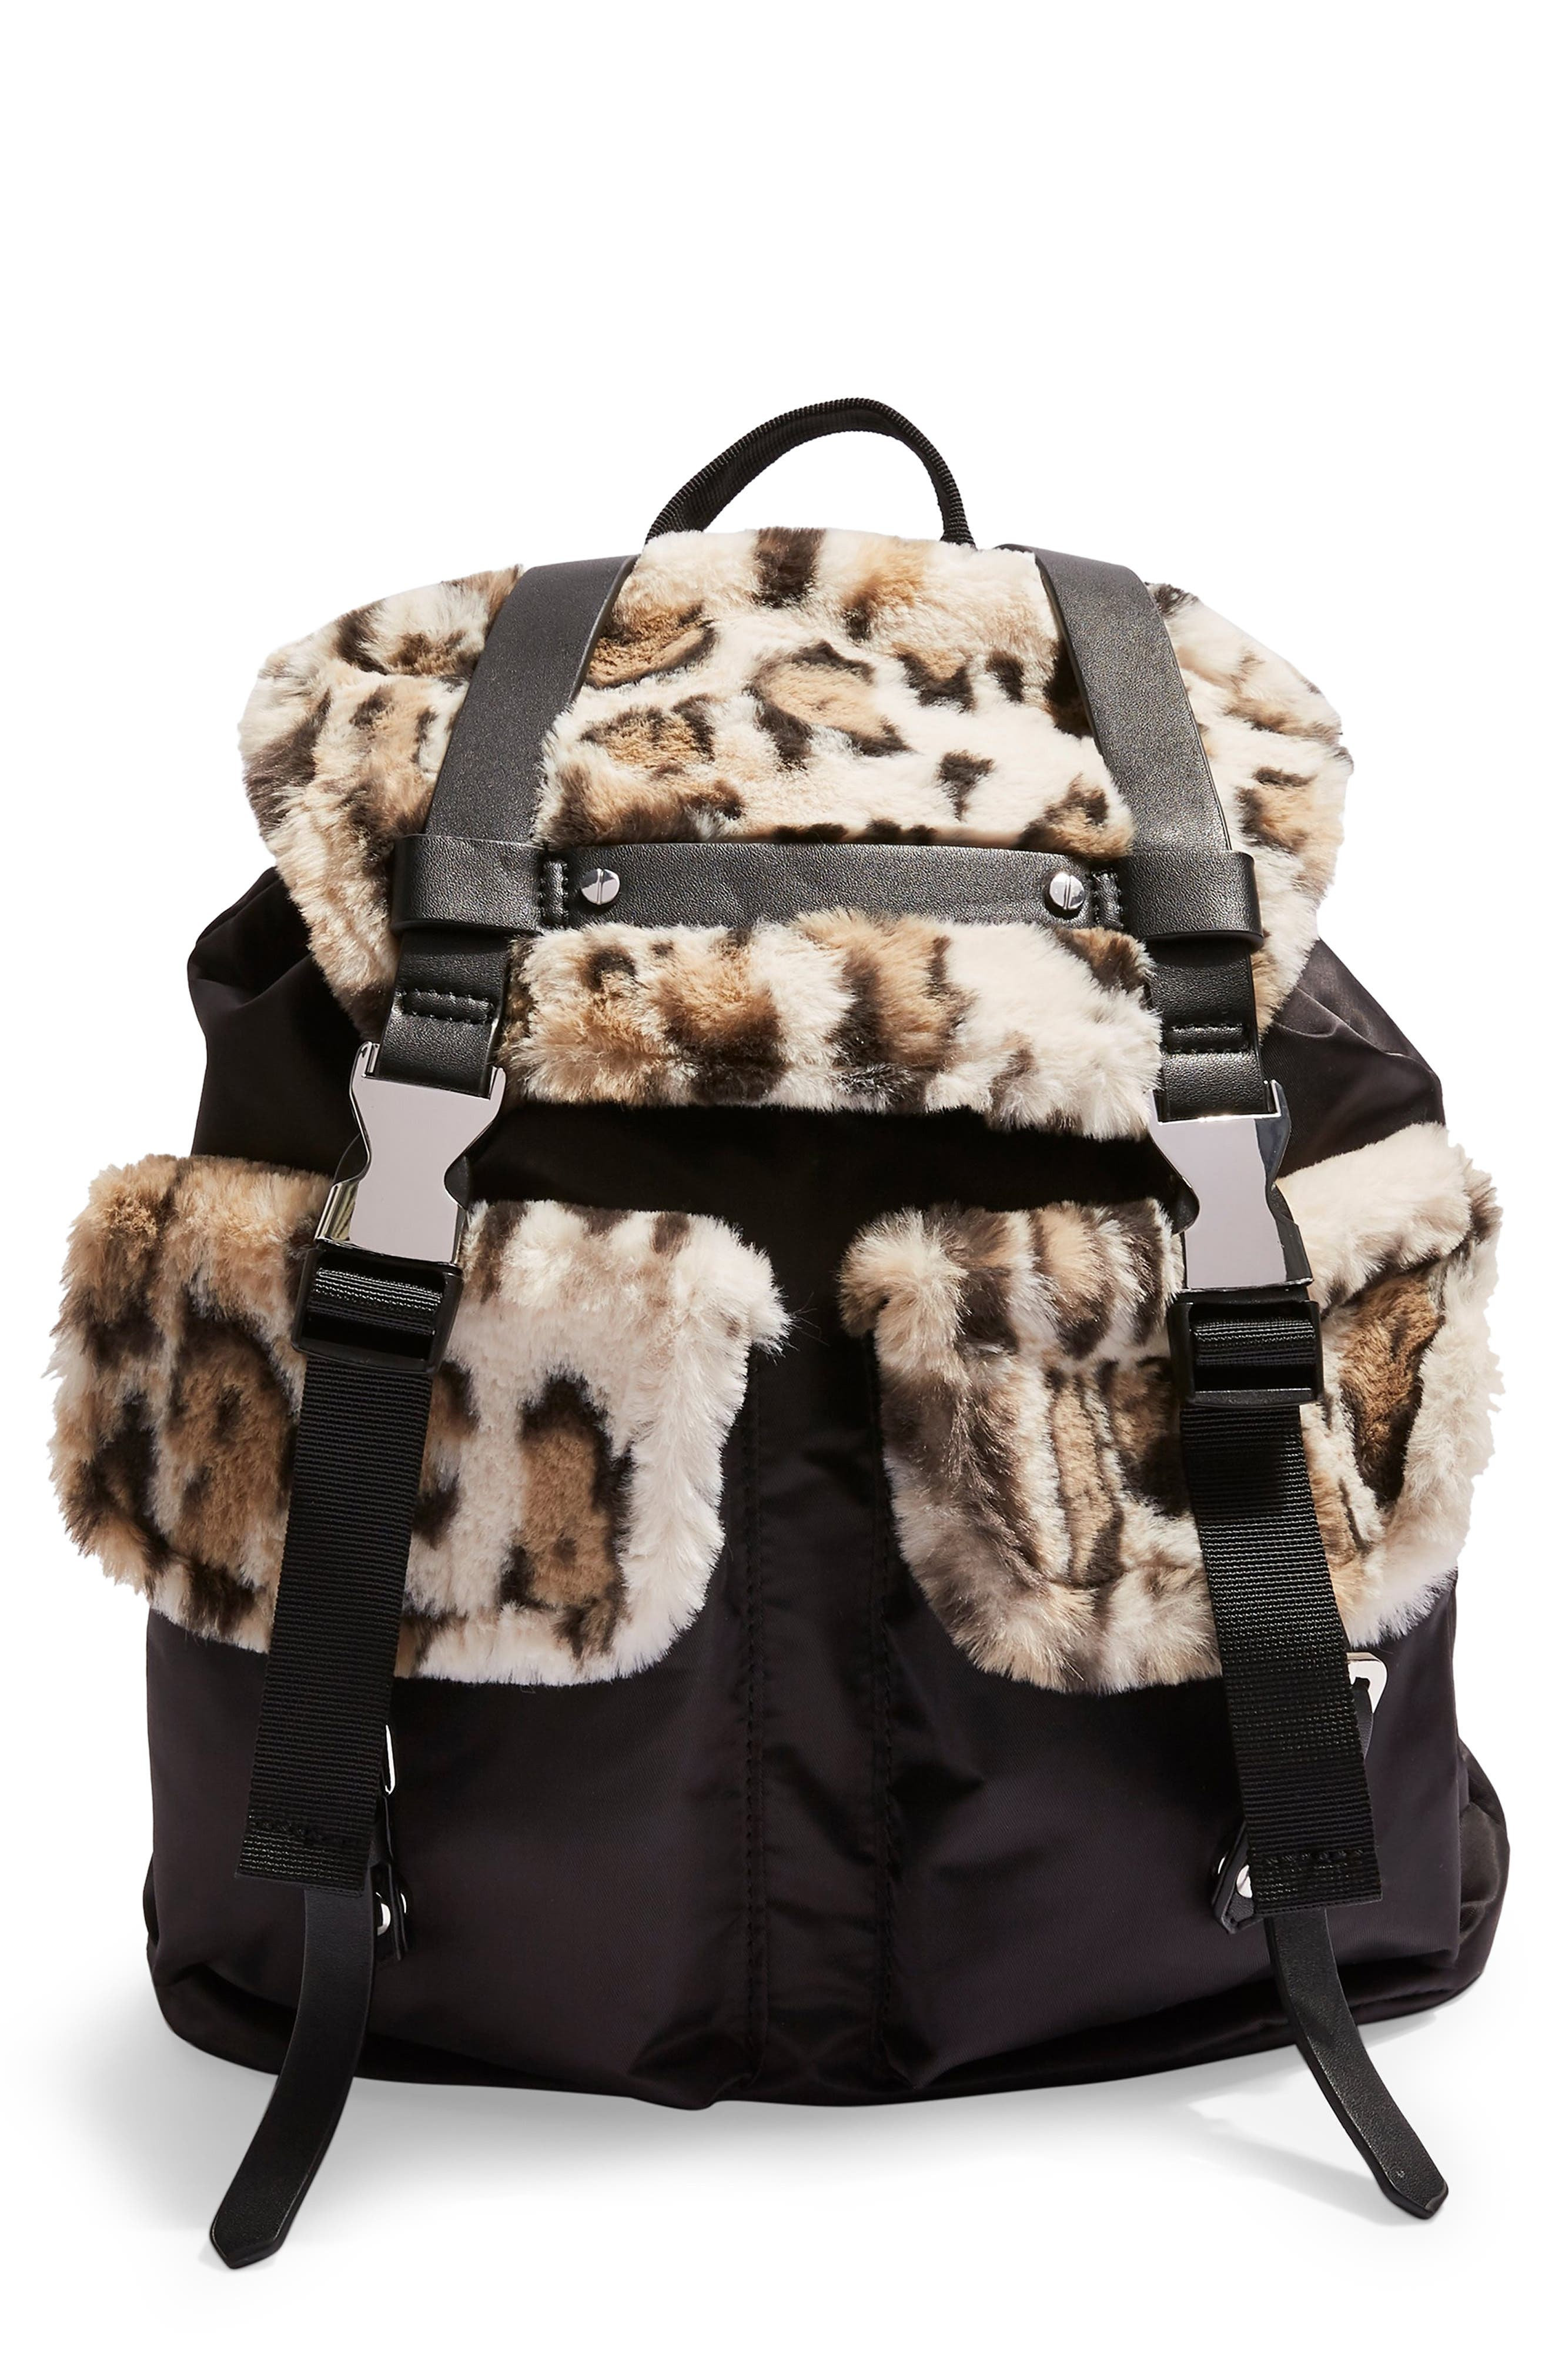 Topshop Boston Faux Fur Backpack - Beige